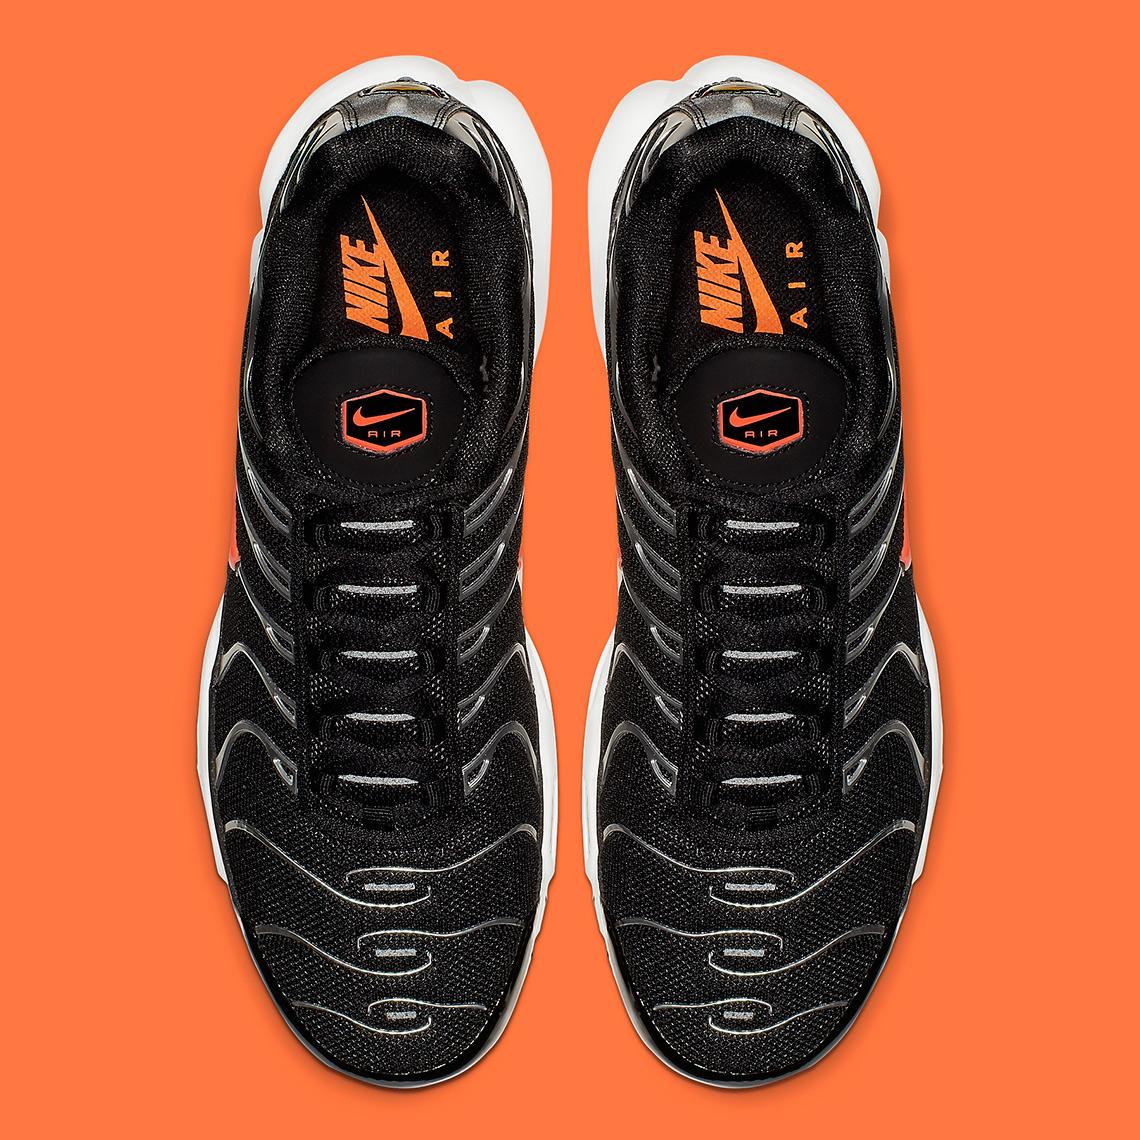 wholesale dealer 1a8e6 5ccc6 Nike Air Max Plus 160. Style Code CD1533-001